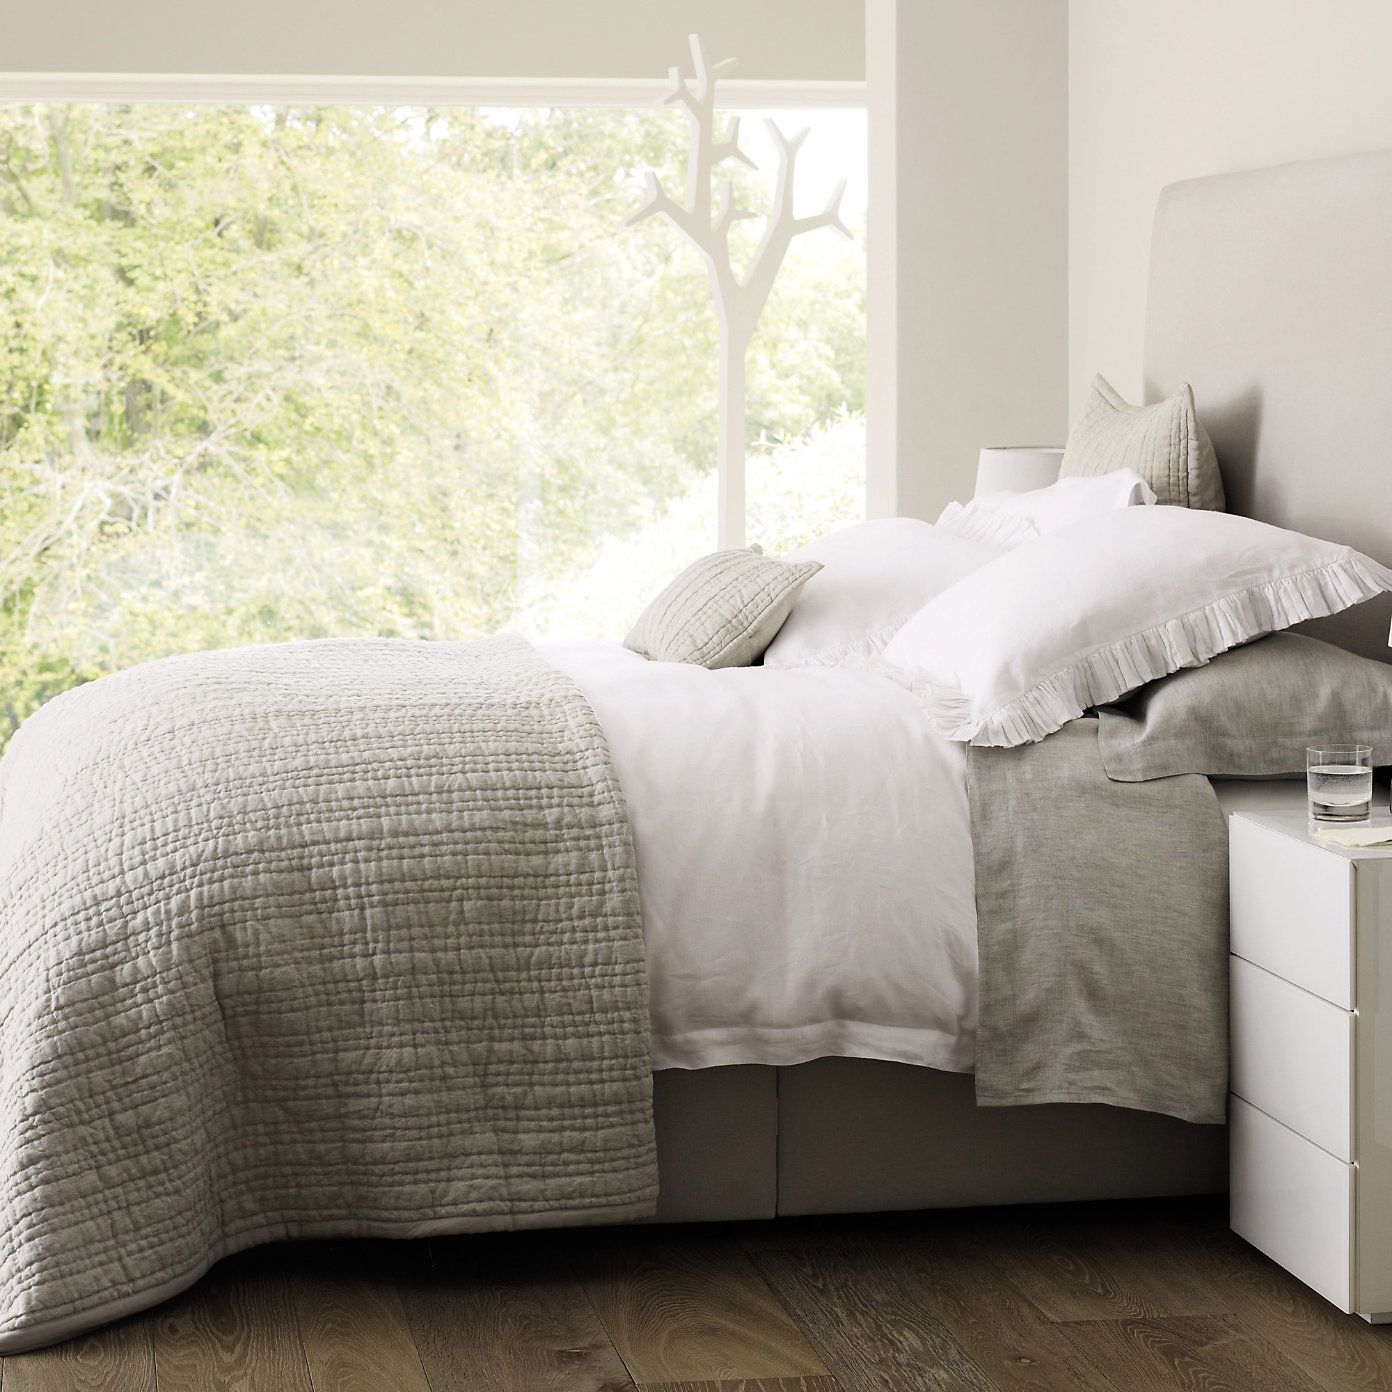 Best Buy Bedroom Bedspreads Cushions Oslo Bedspread From 400 x 300